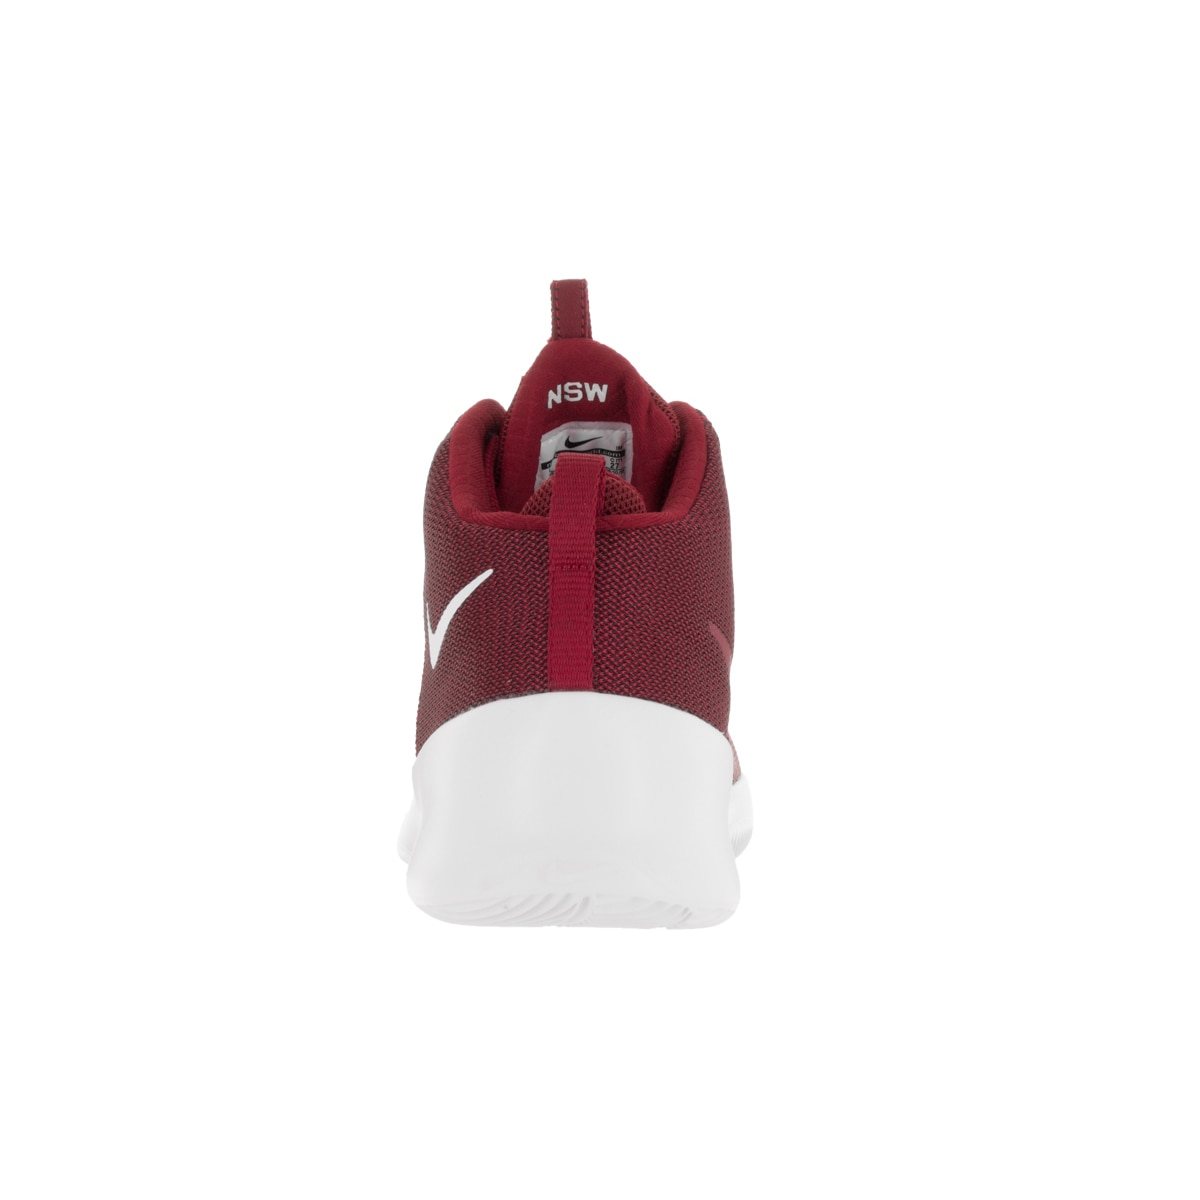 sale retailer 2bfa2 64311 Shop Nike Men s Hyperfr3sh Gym Red Summit White Basketball Shoe - Free  Shipping Today - Overstock.com - 13394867